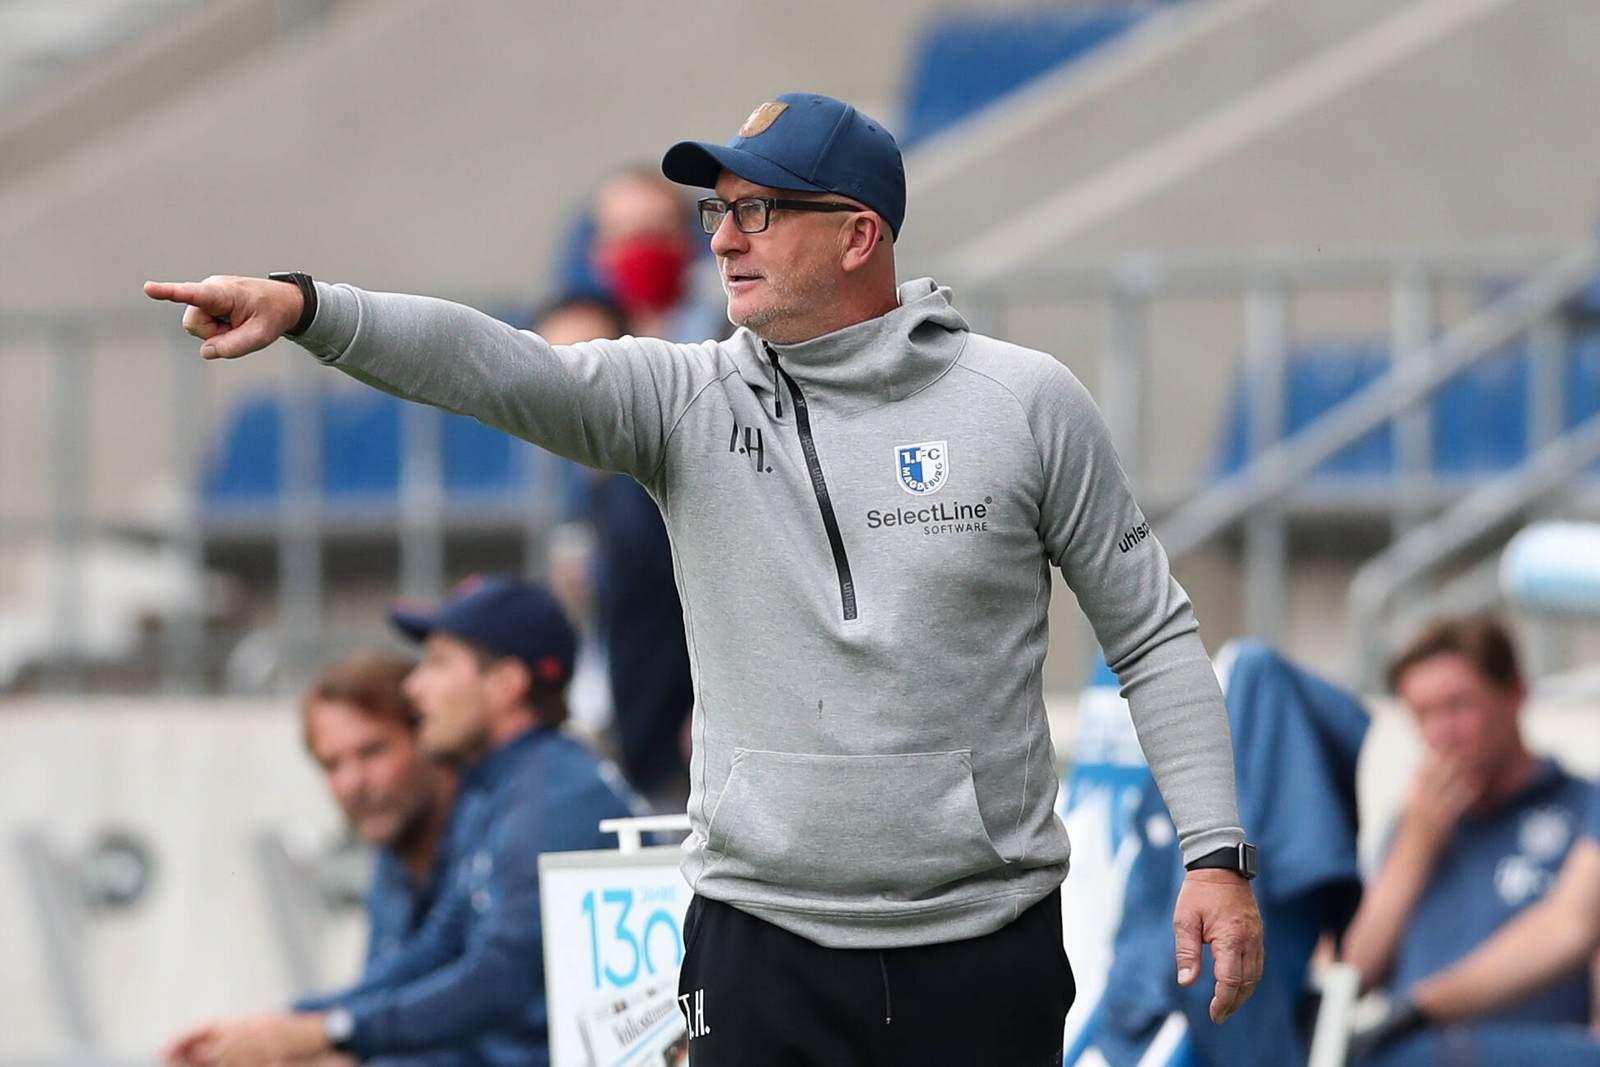 Thomas Hoßmang vom 1. FC Magdeburg